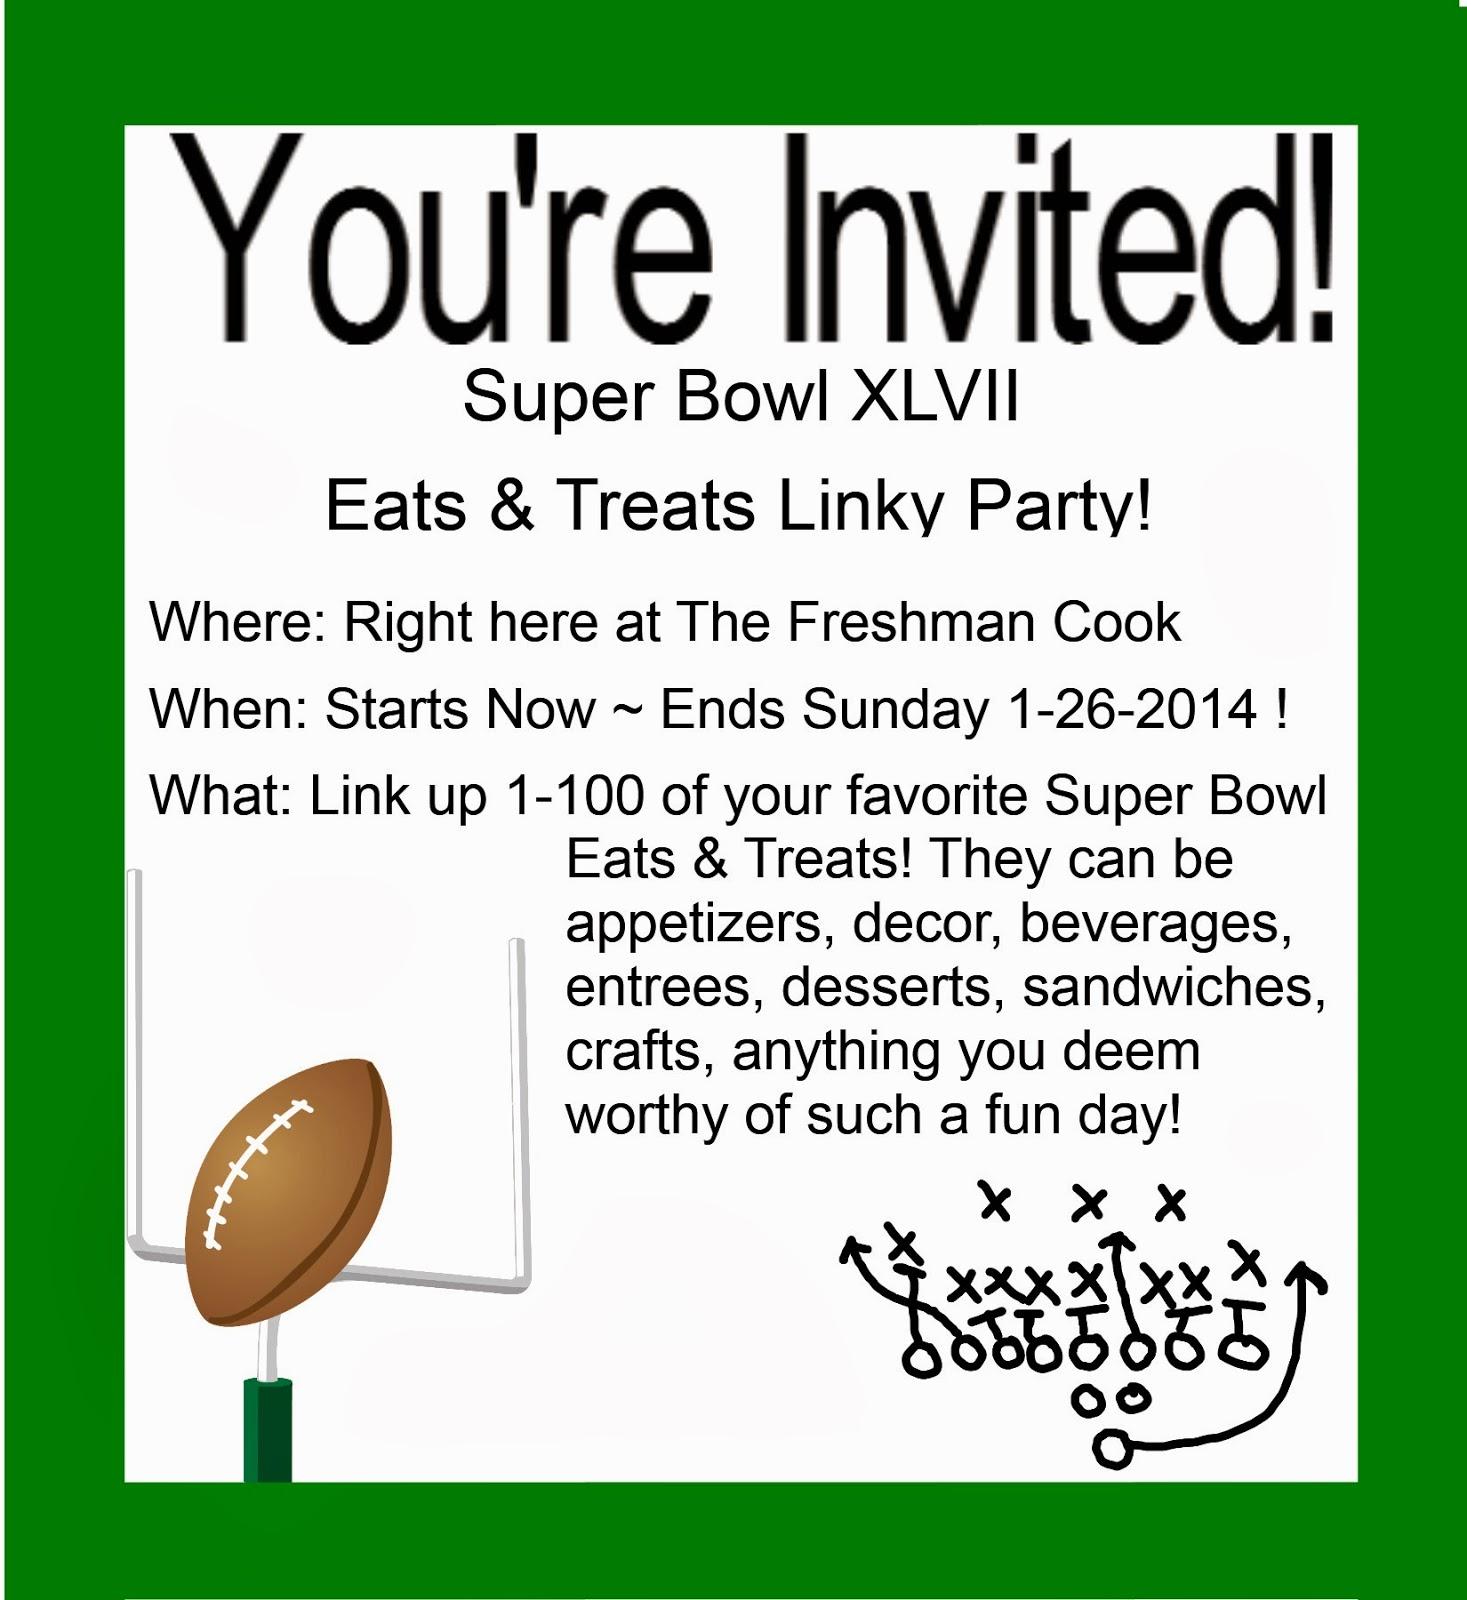 Super Bowl Potluck Invitations Pictures to Pin – Super Bowl Party Invitation Wording